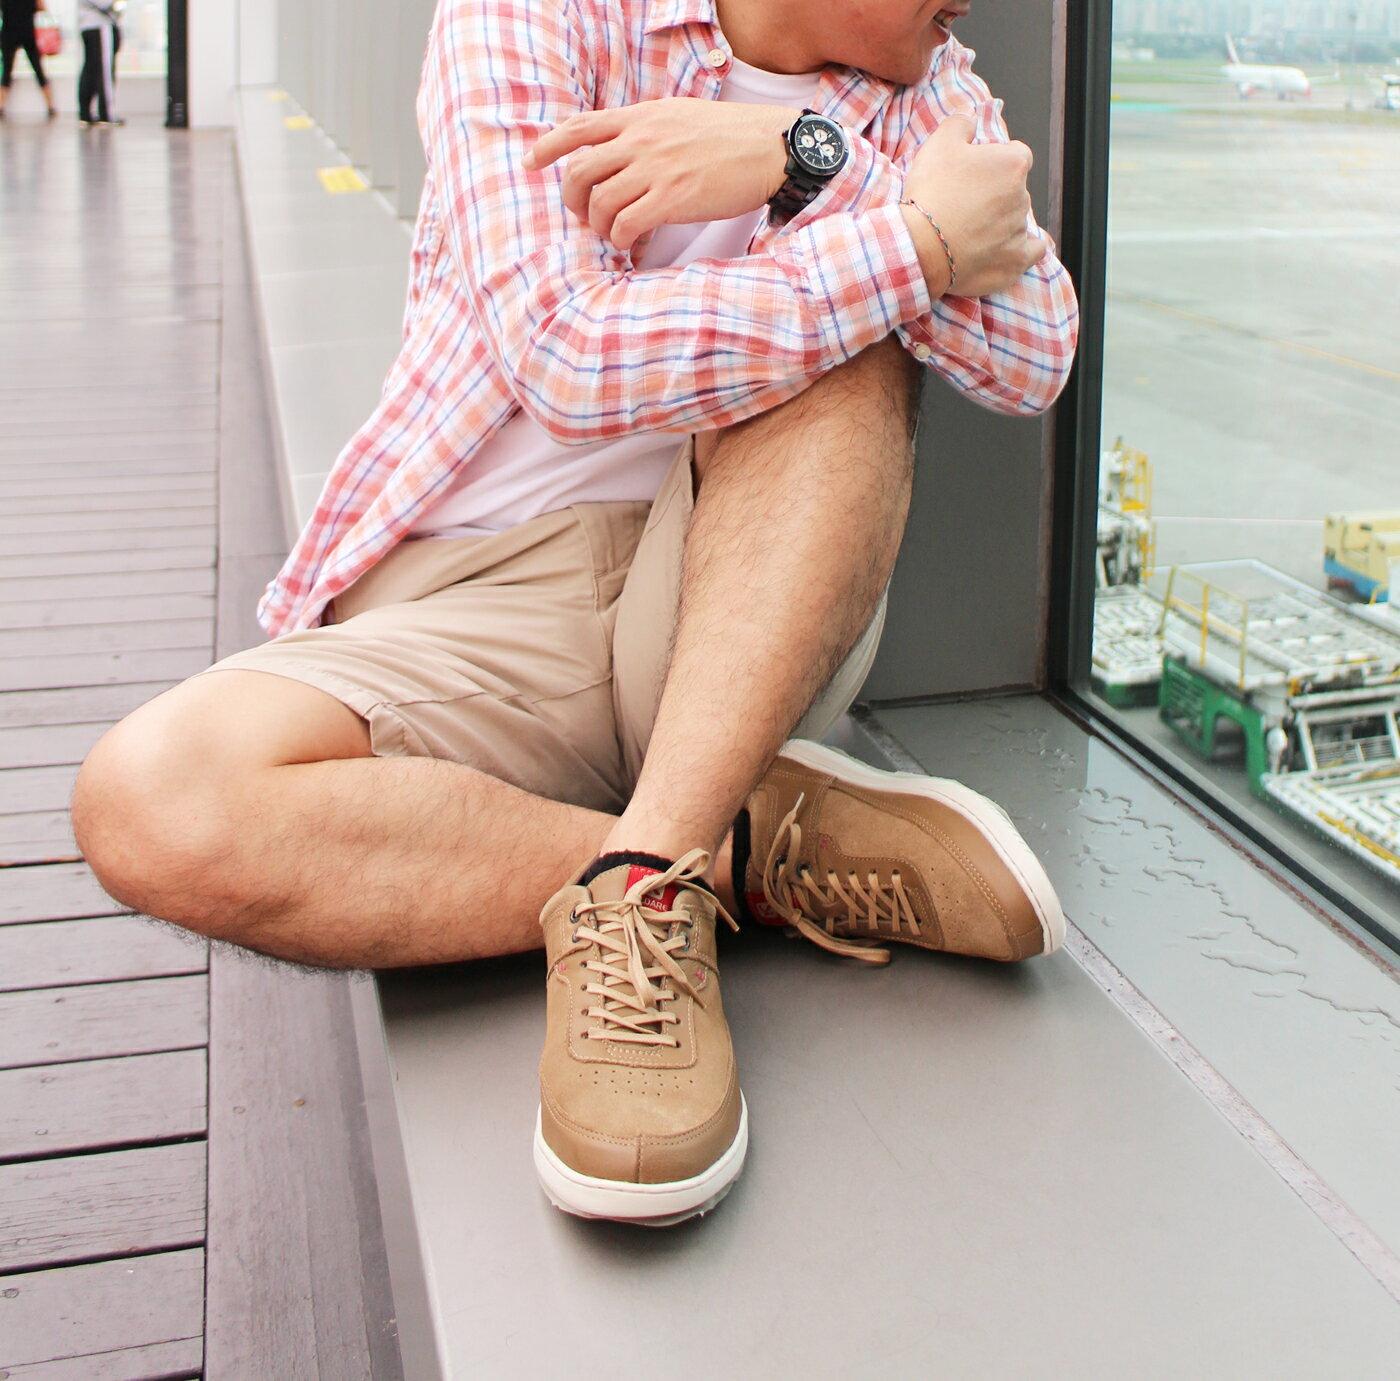 【KILDARE 85折】KILDARE 綁帶休閒鞋 淺咖啡 男 慢跑休閒 7